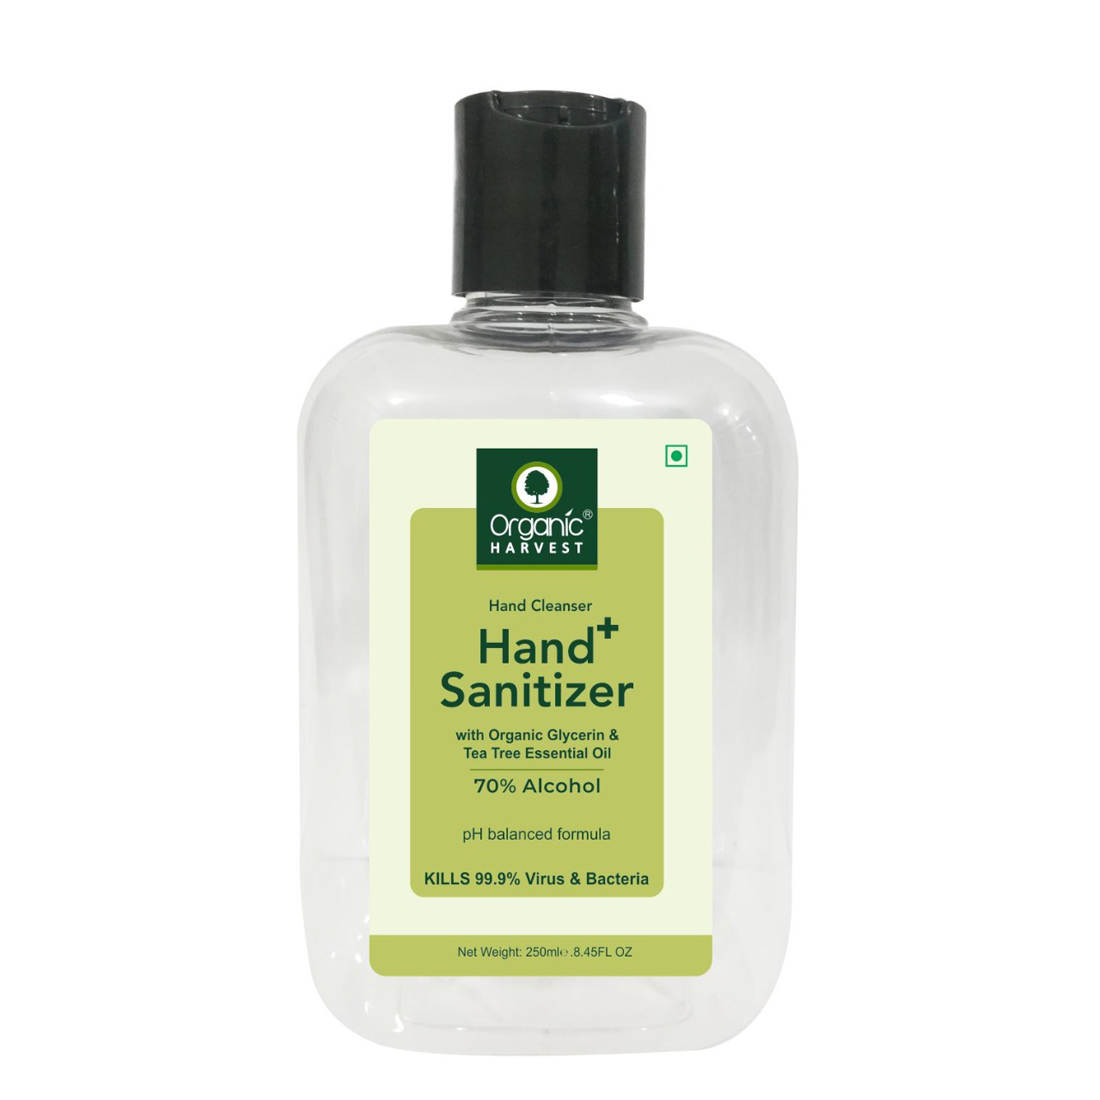 Organic Harvest | Organic Harvest Instant Anti - Bacterial Gel Hand Sanitizer & Hand Cleanser with Organic Glycerin & Tea Tree Essential Oil, 70% Alcohol, Kills 99.9% Virus & Bacteria, 250ml